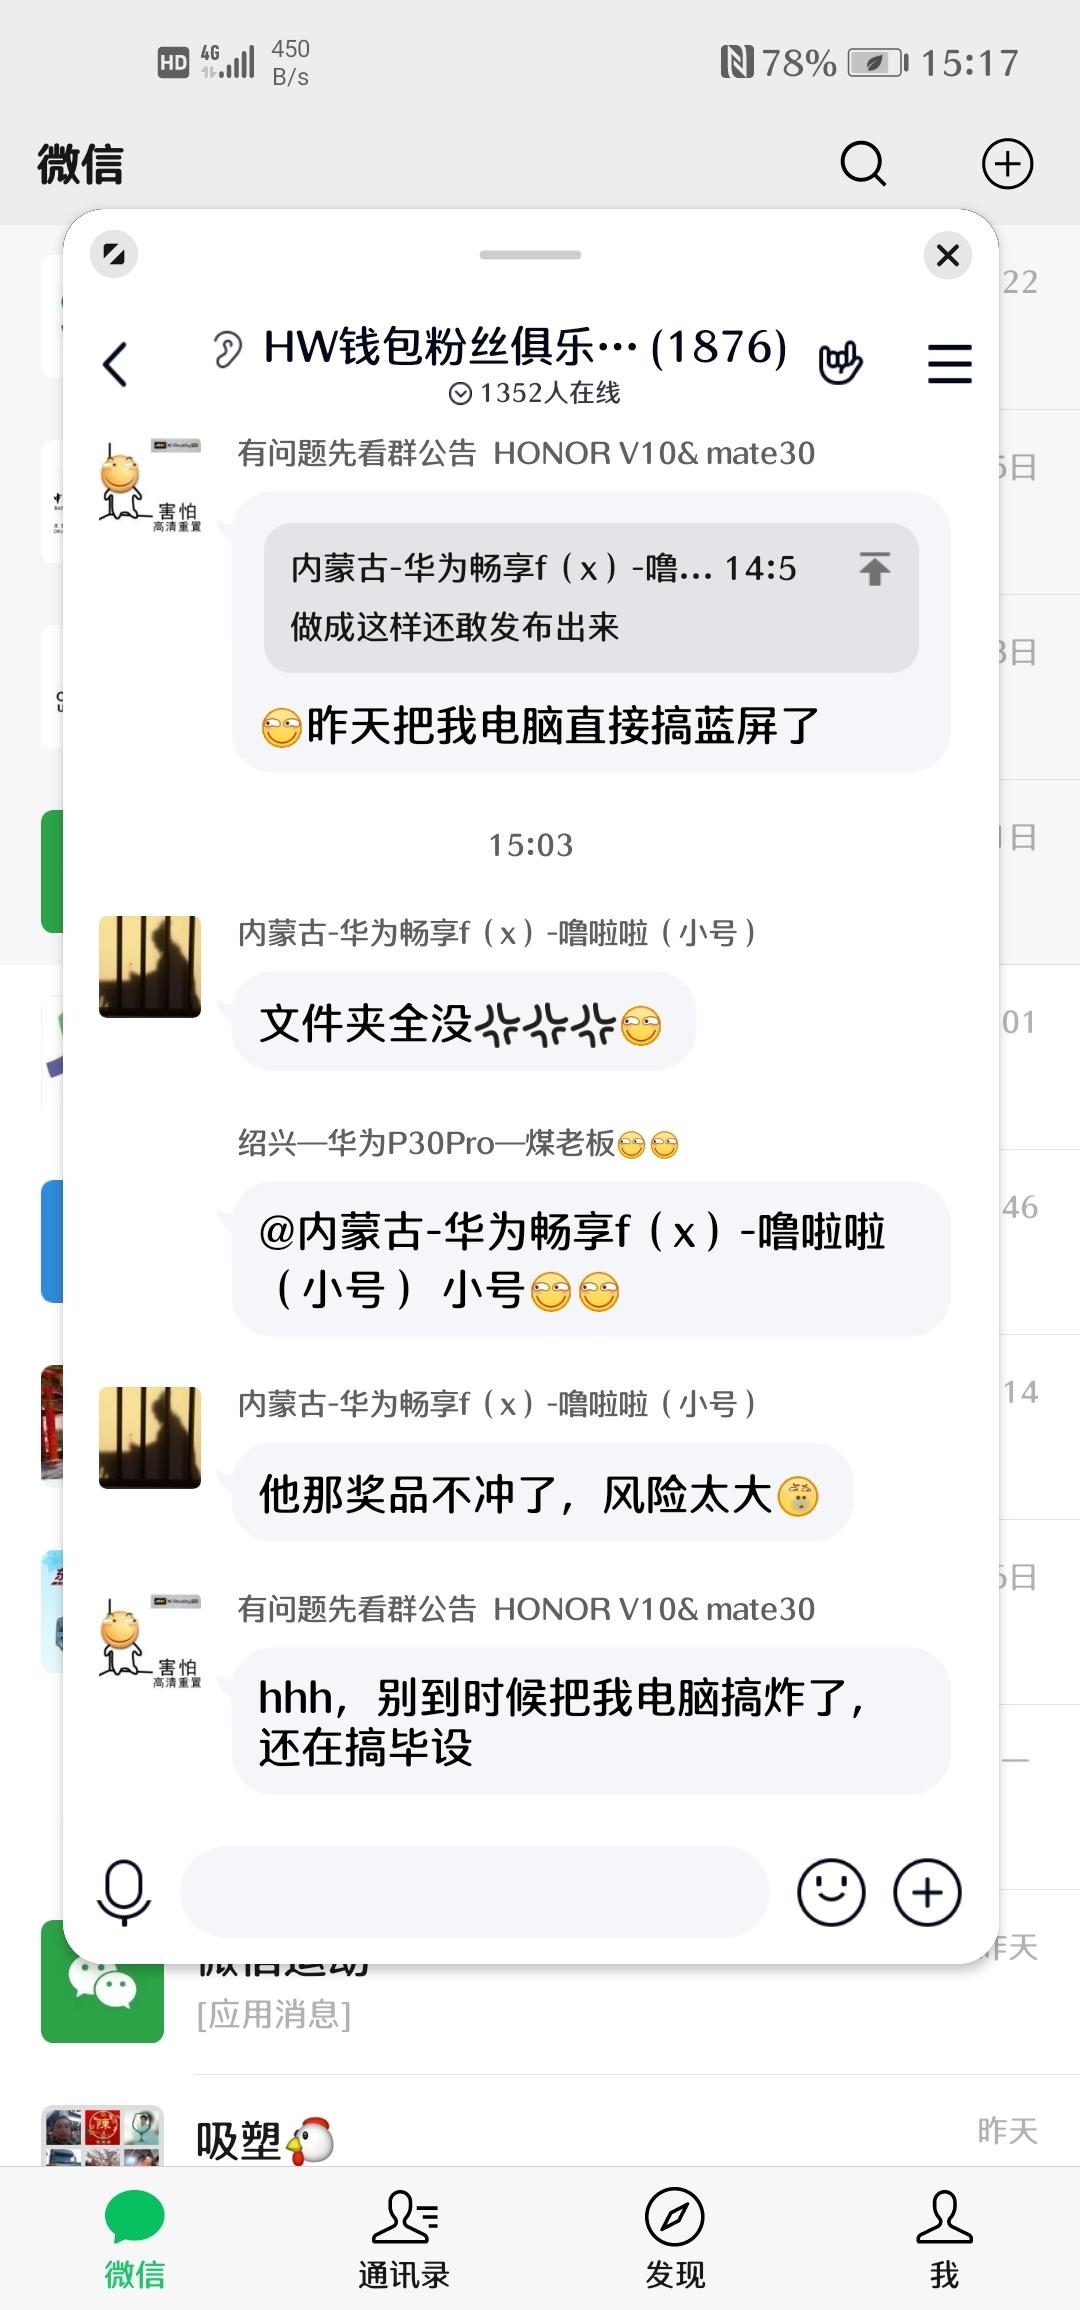 Screenshot_20200520_151709_com.tencent.mobileqq.jpg